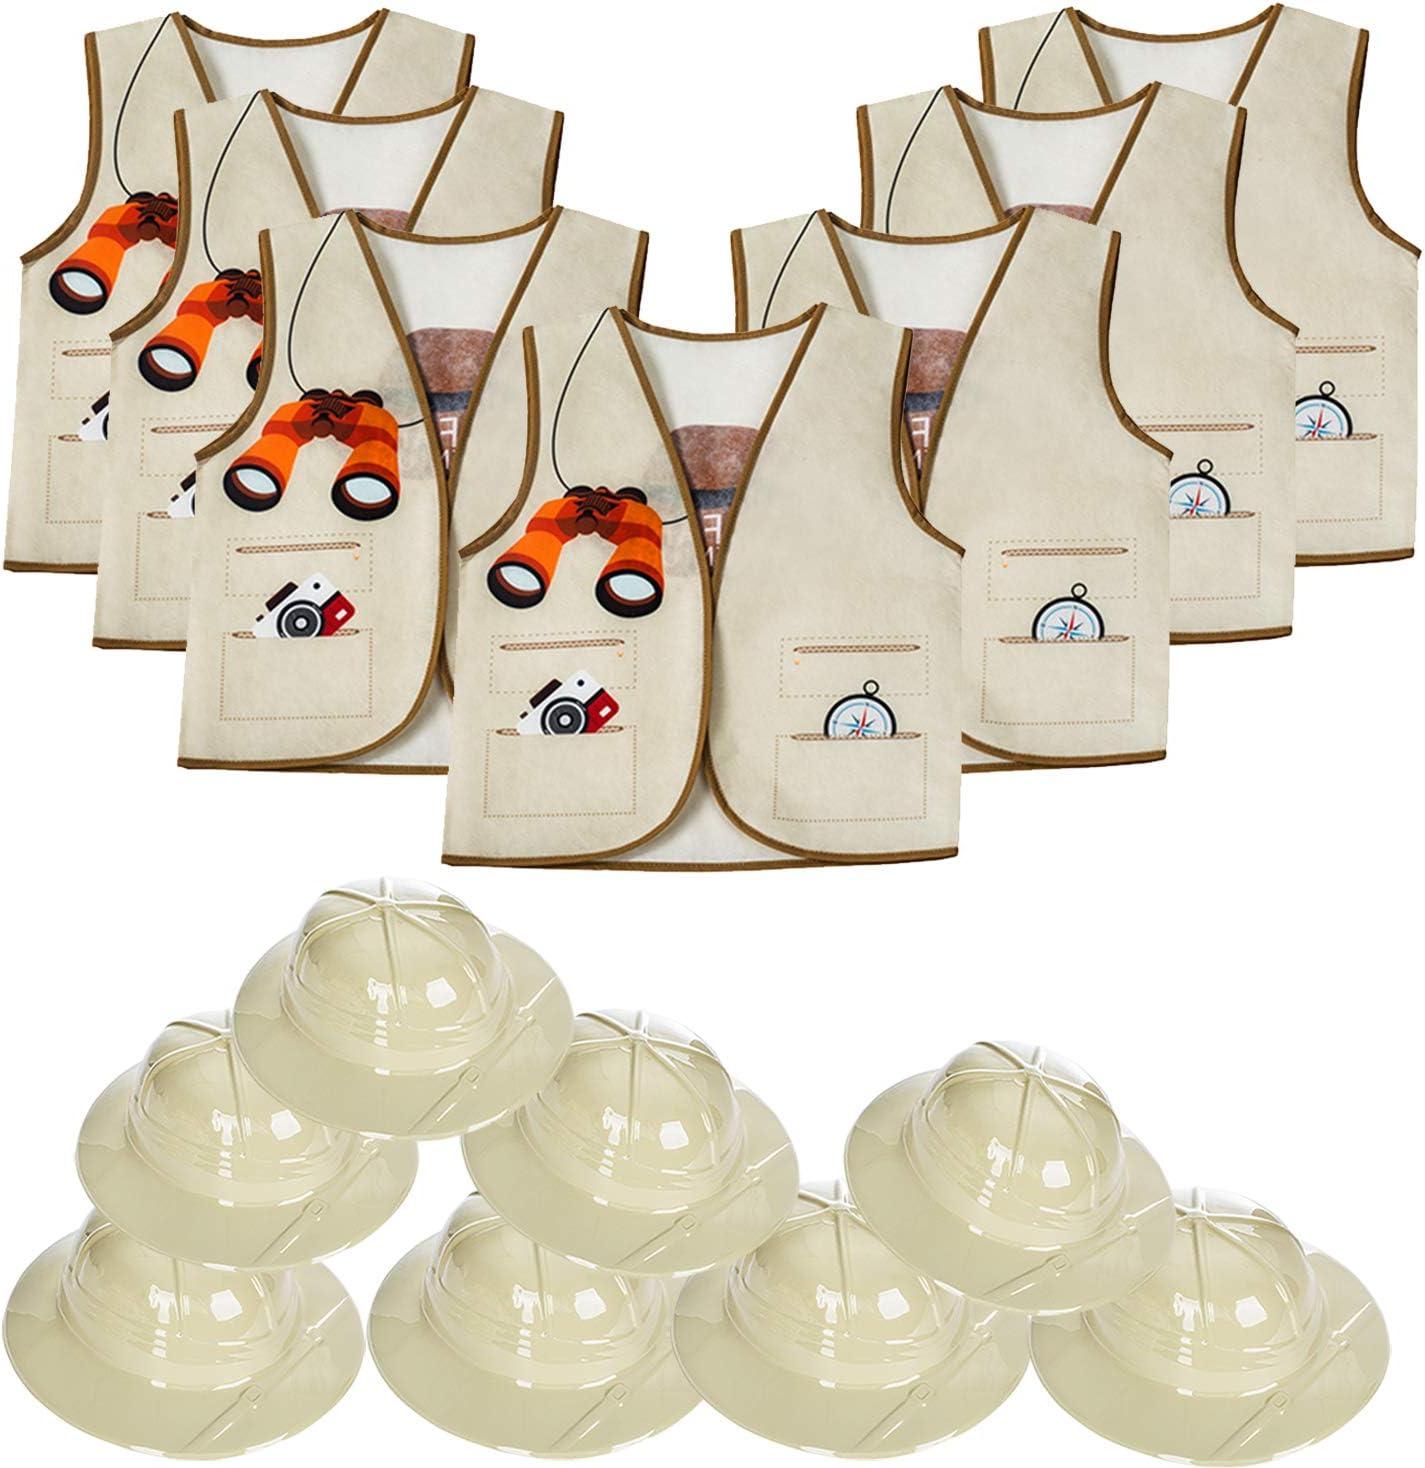 Tigerdoe Pith High quality new Spring new work Helmets for Kids - 8 Jungl Hats Safari Vests